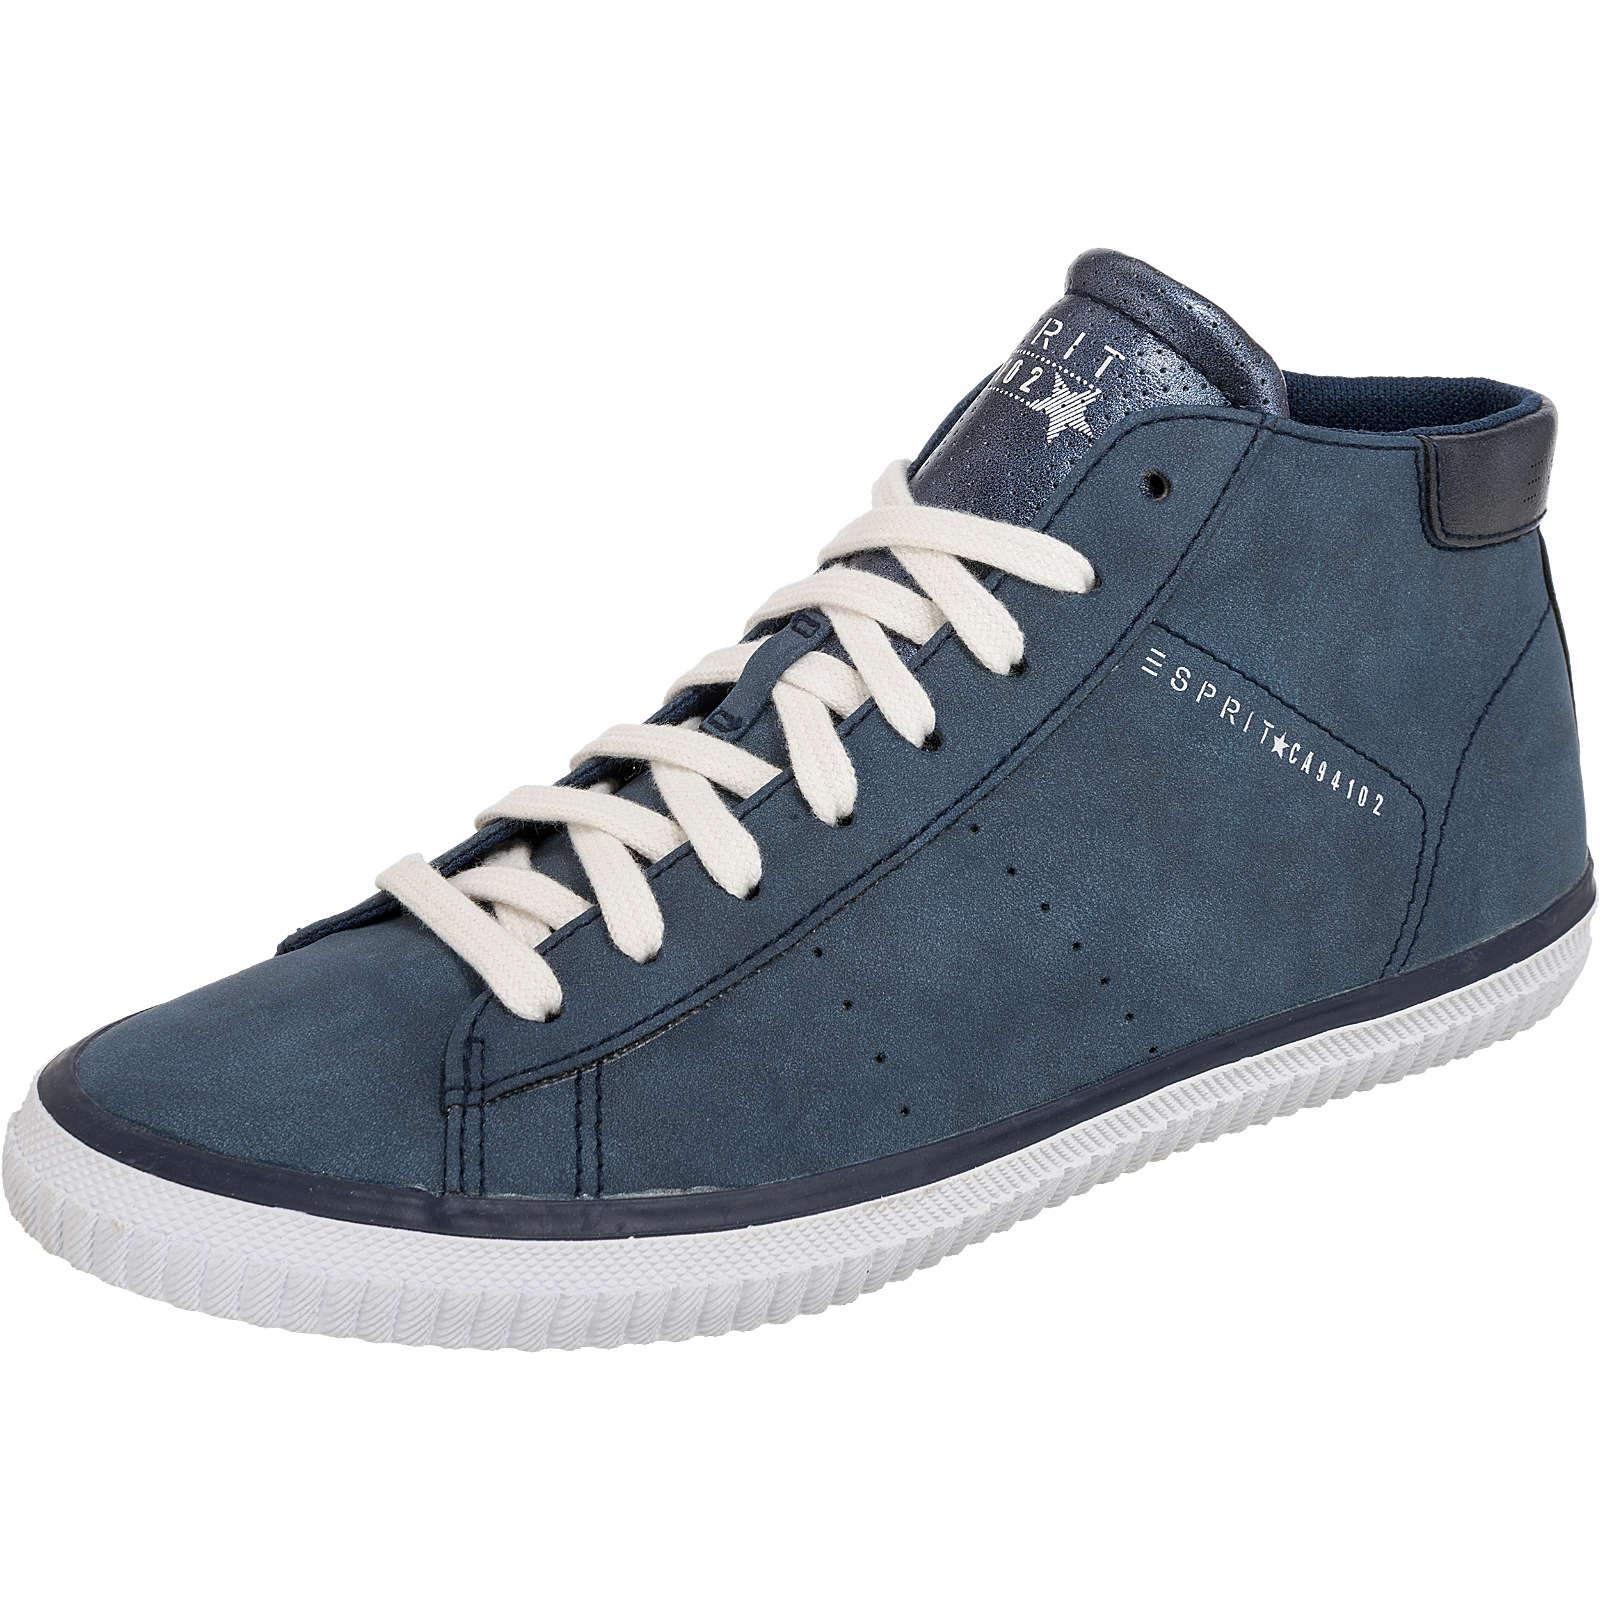 ESPRIT Riata Bootie Sneakers High blau Damen Gr. 36